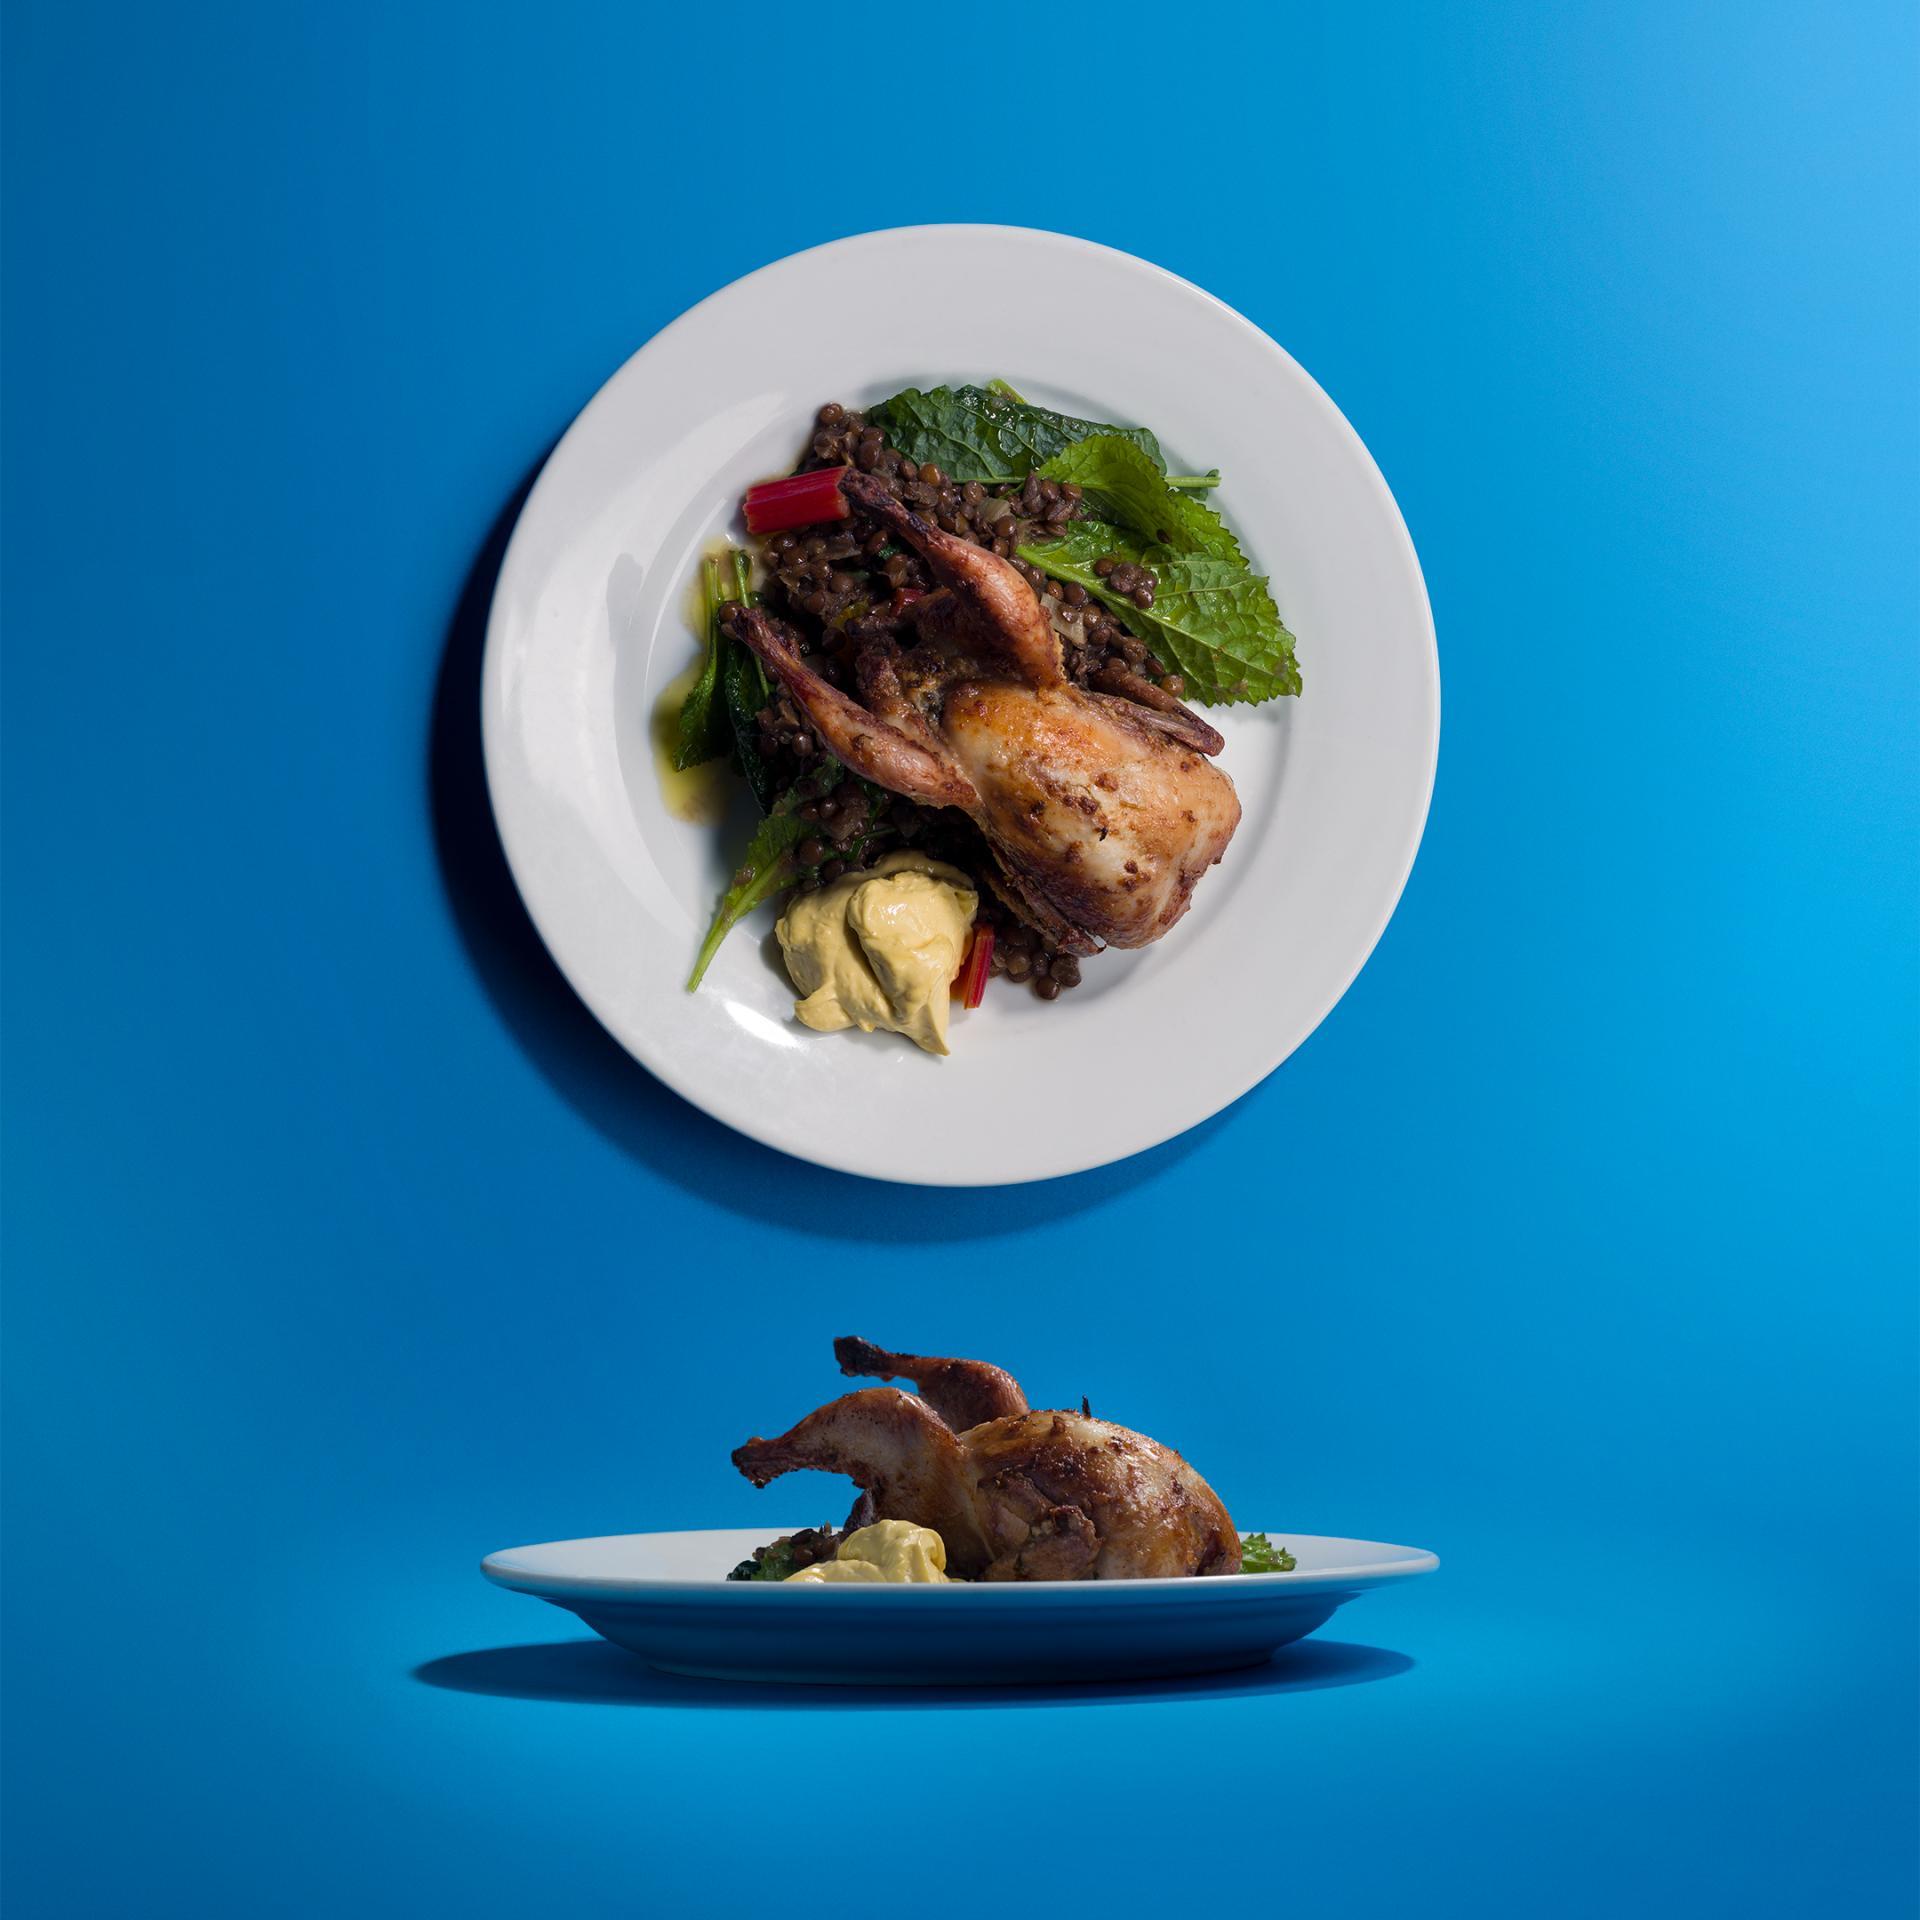 Margot Henderson's quail, lentils and aioli